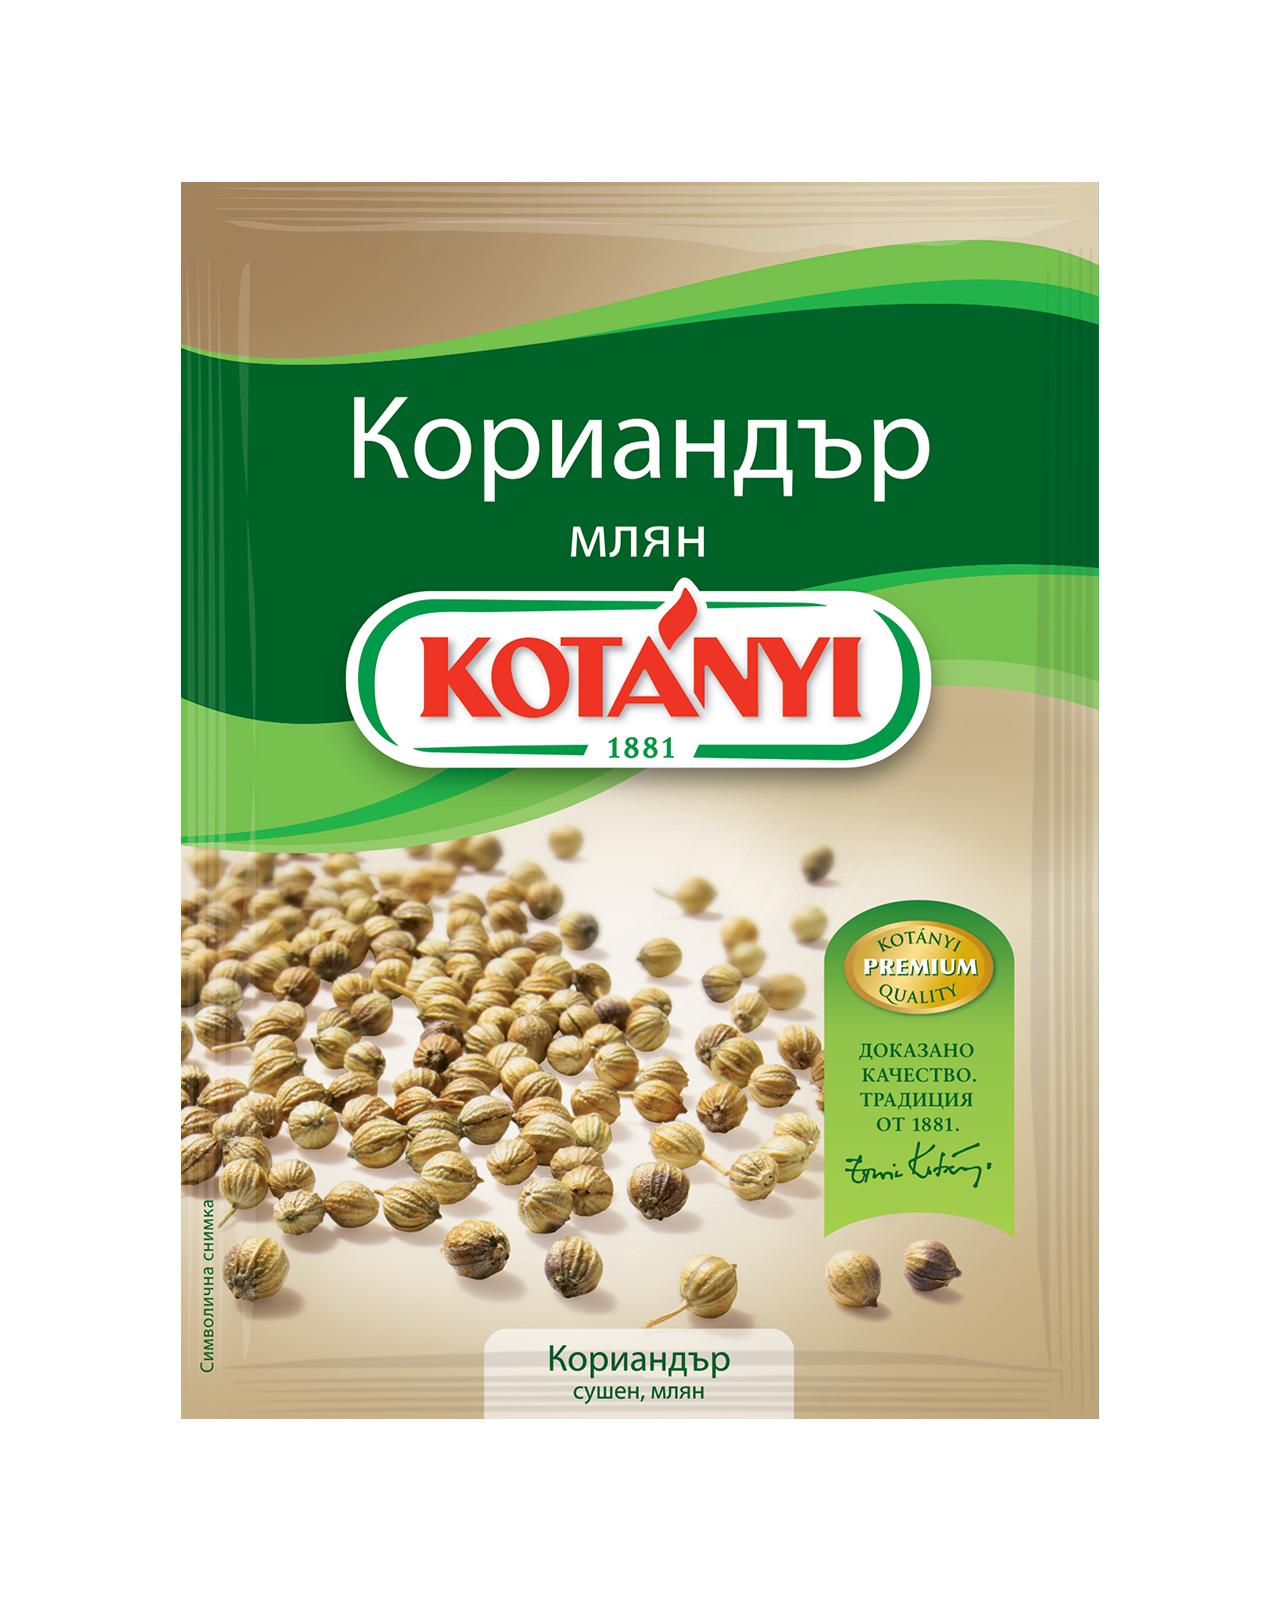 152910 Kotanyi Кориандър млян B2c Pouch